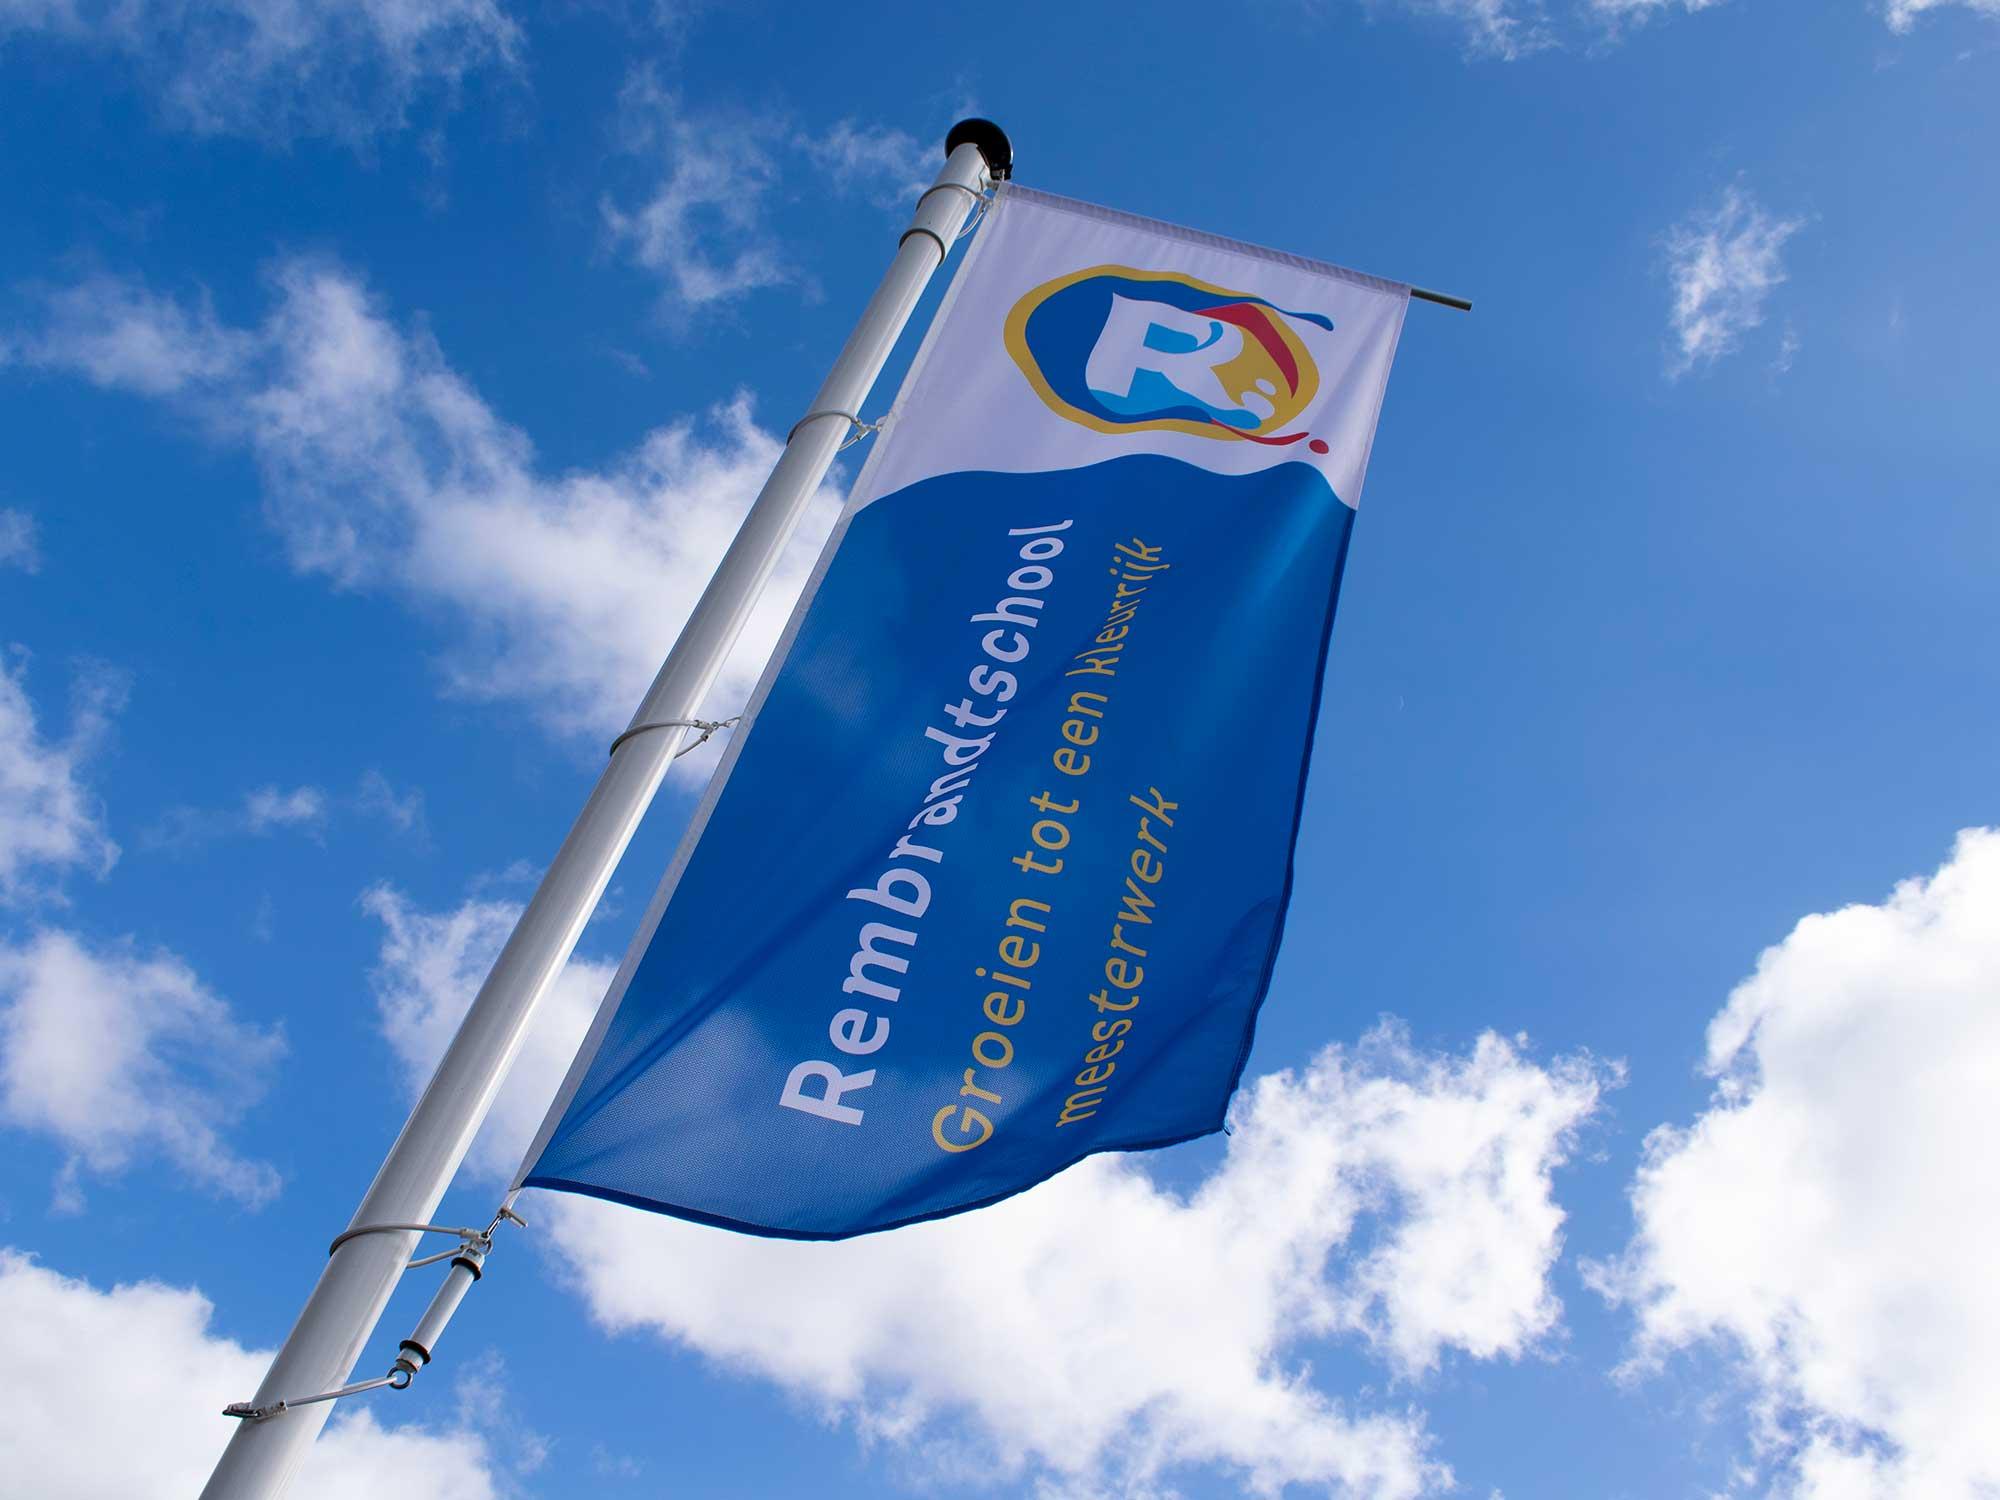 Impulsar scuolaRembrandt bandiera